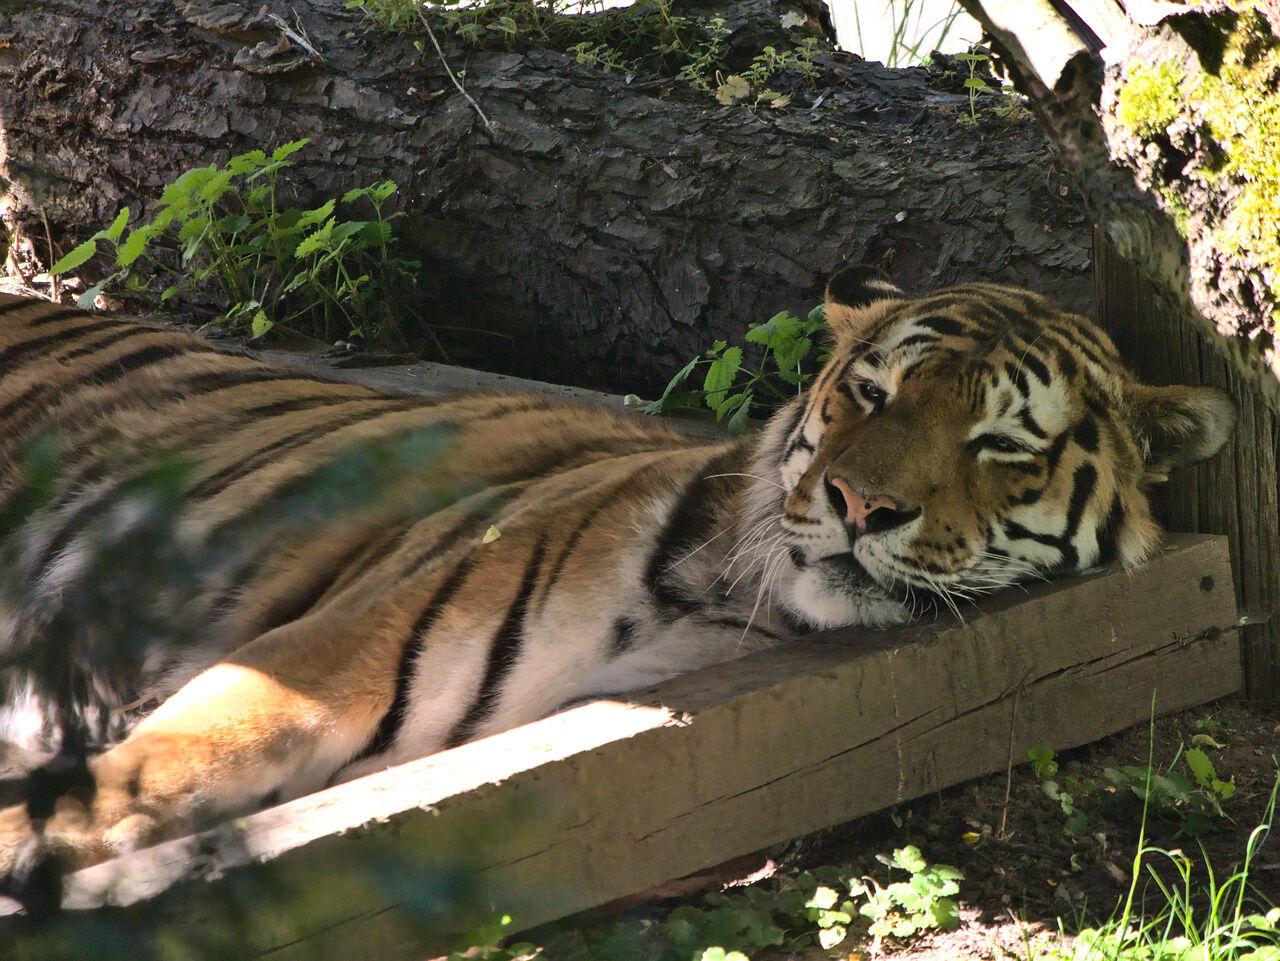 20200524_Zoo_Landau_002